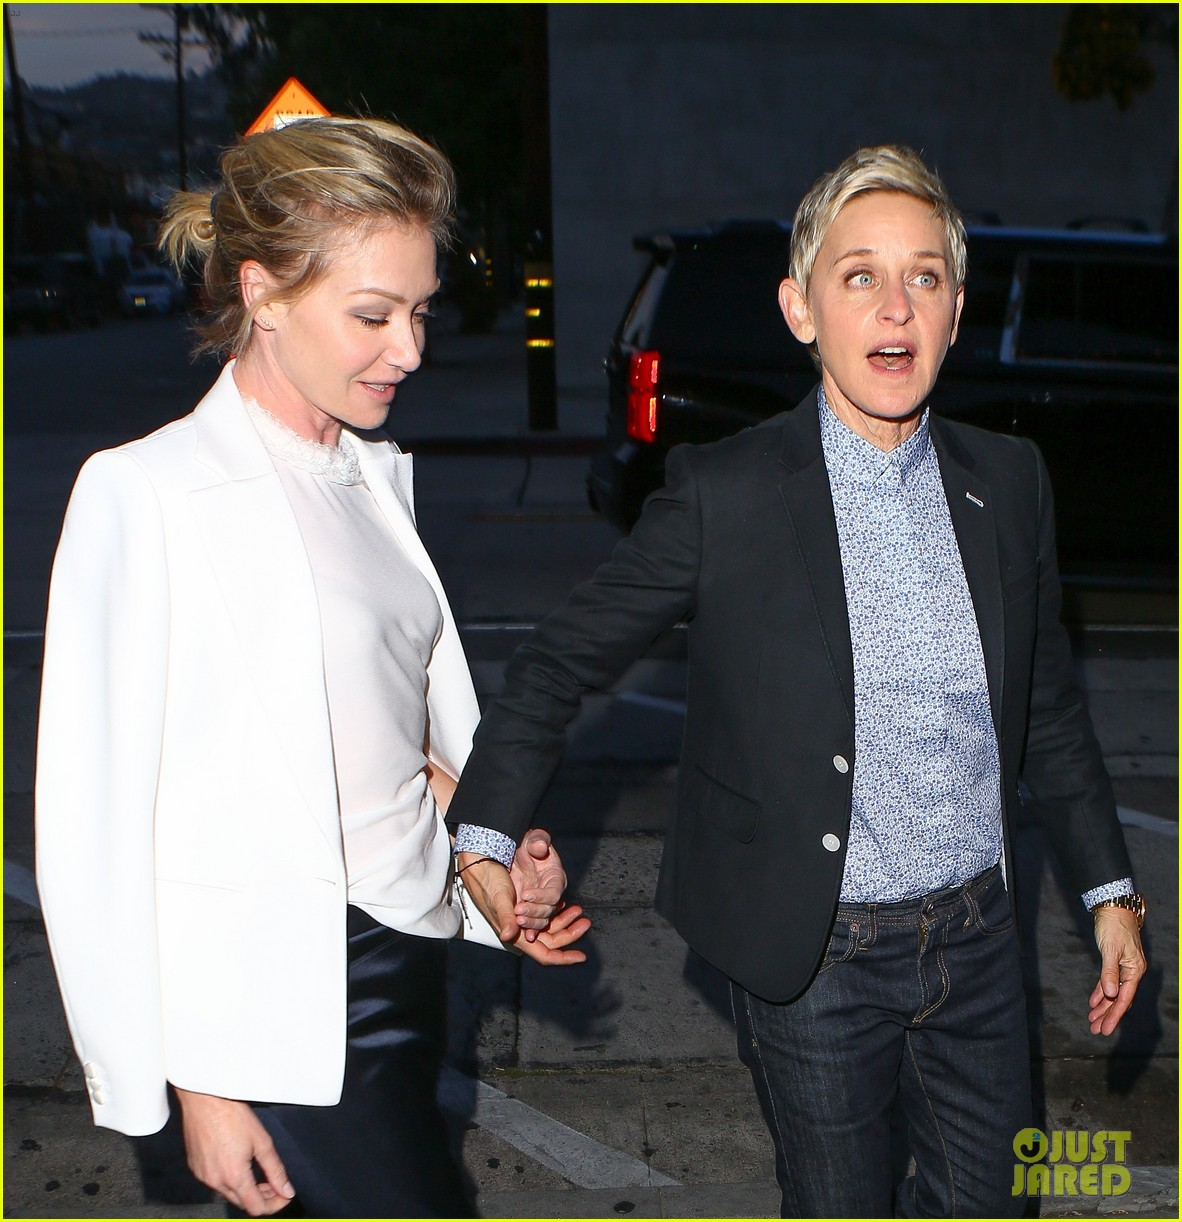 Portia De Rossi Wedding Gown: Ellen DeGeneres & Portia De Rossi Enjoy Date Night At